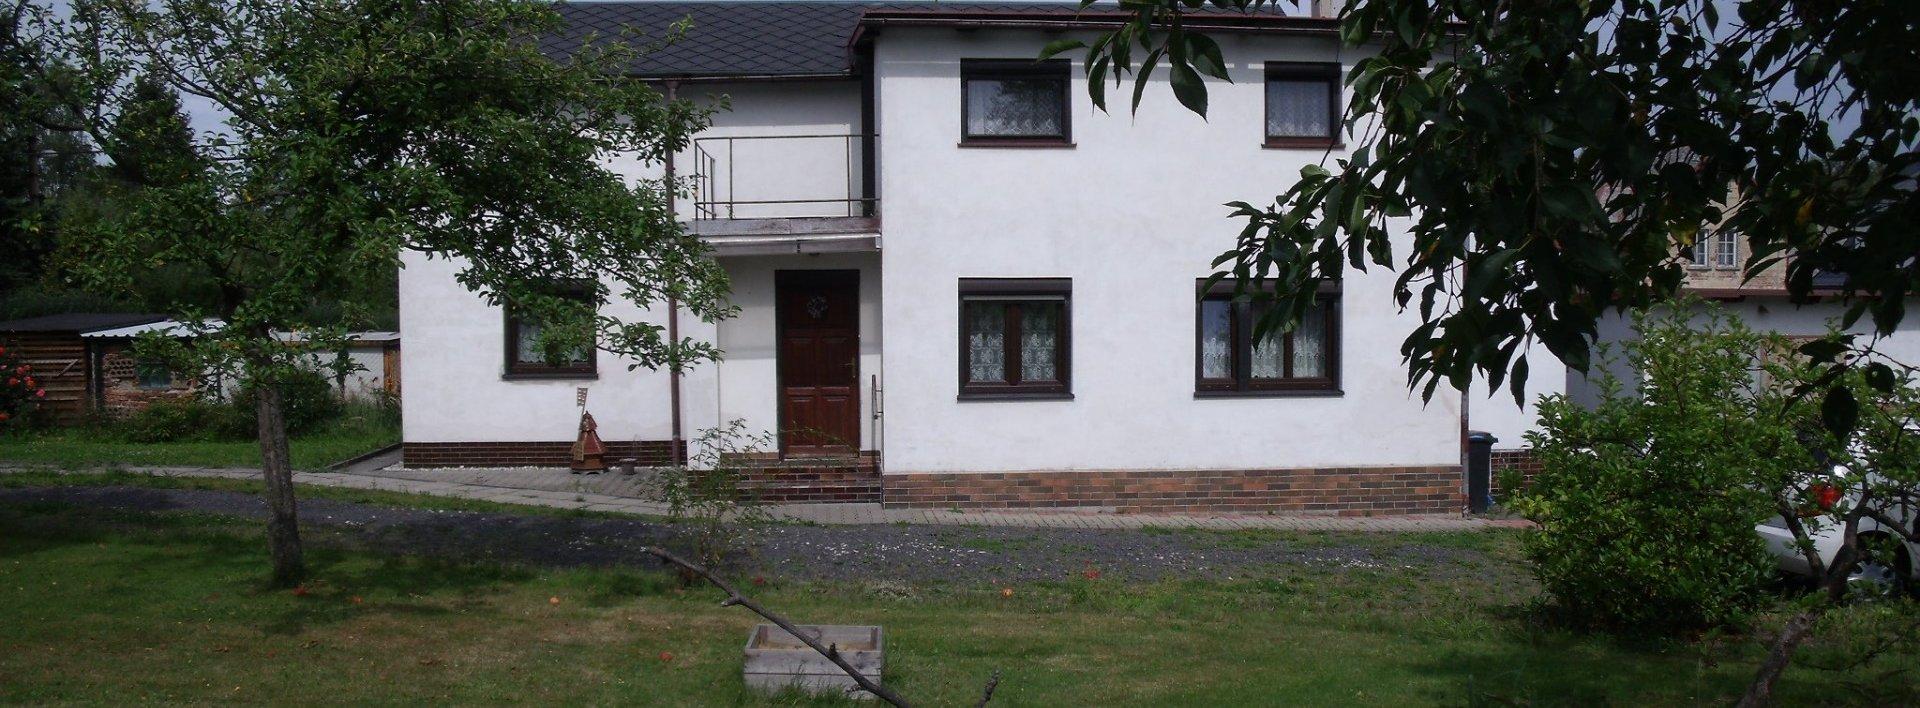 Prodej hezkého rodinného domu v Krásné Lípě, okr. Děčín, Ev.č.: N48863